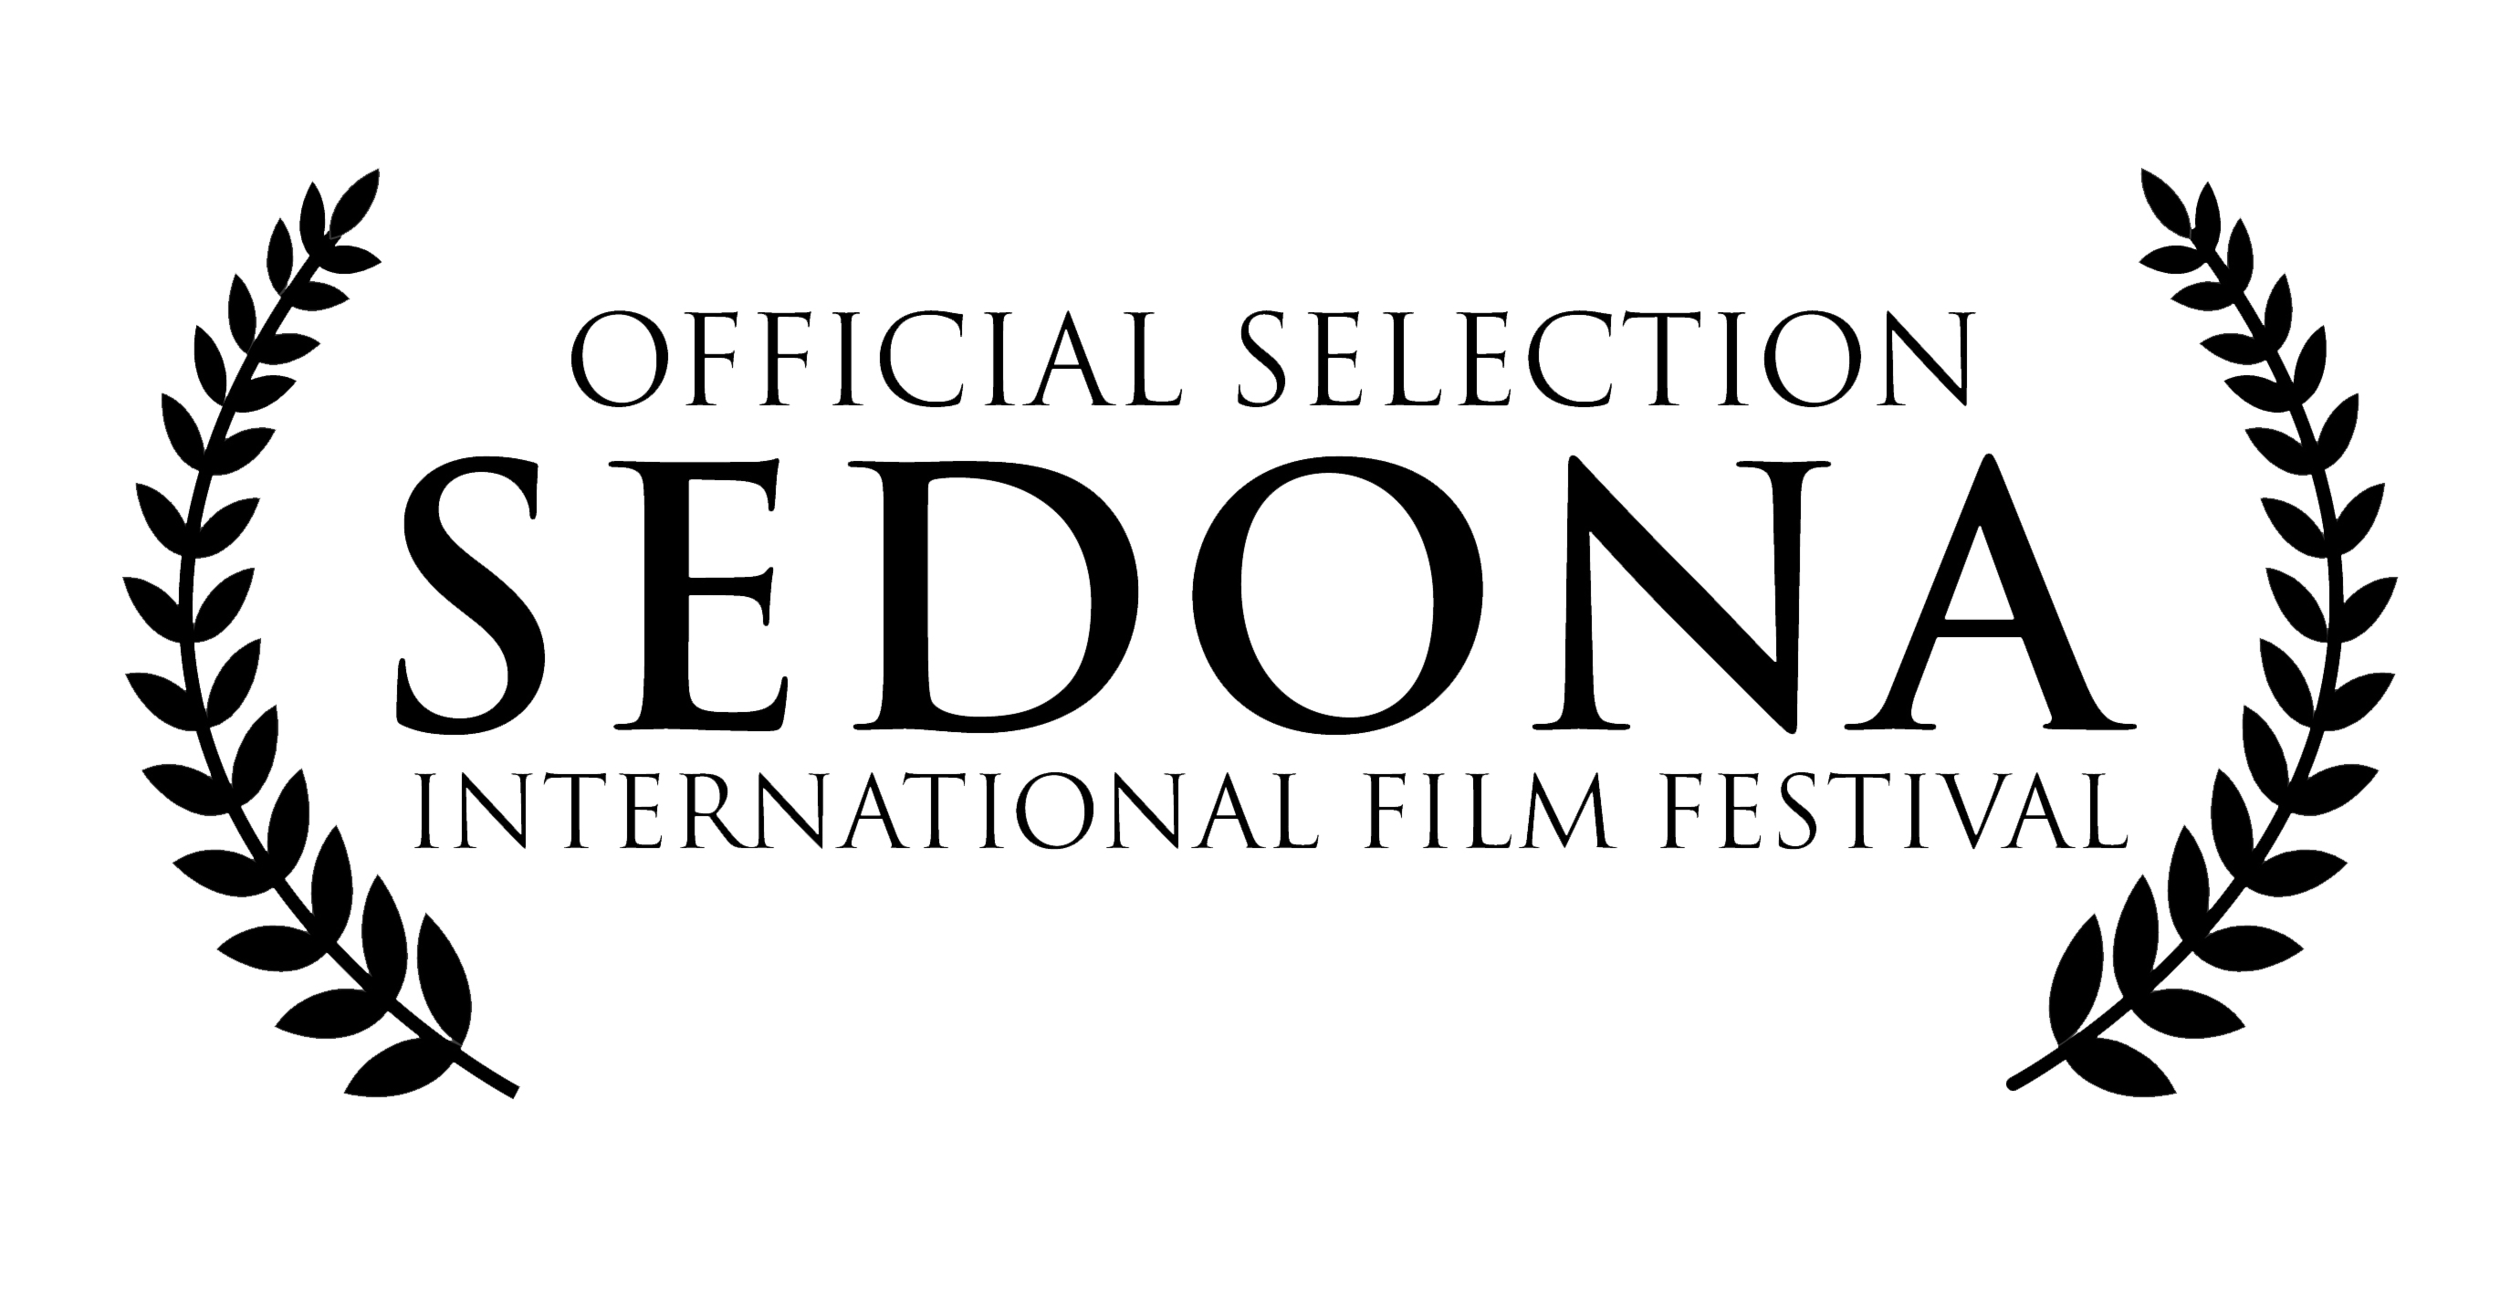 SedonaAZ-IFF-2019-official-selection-laurels.png